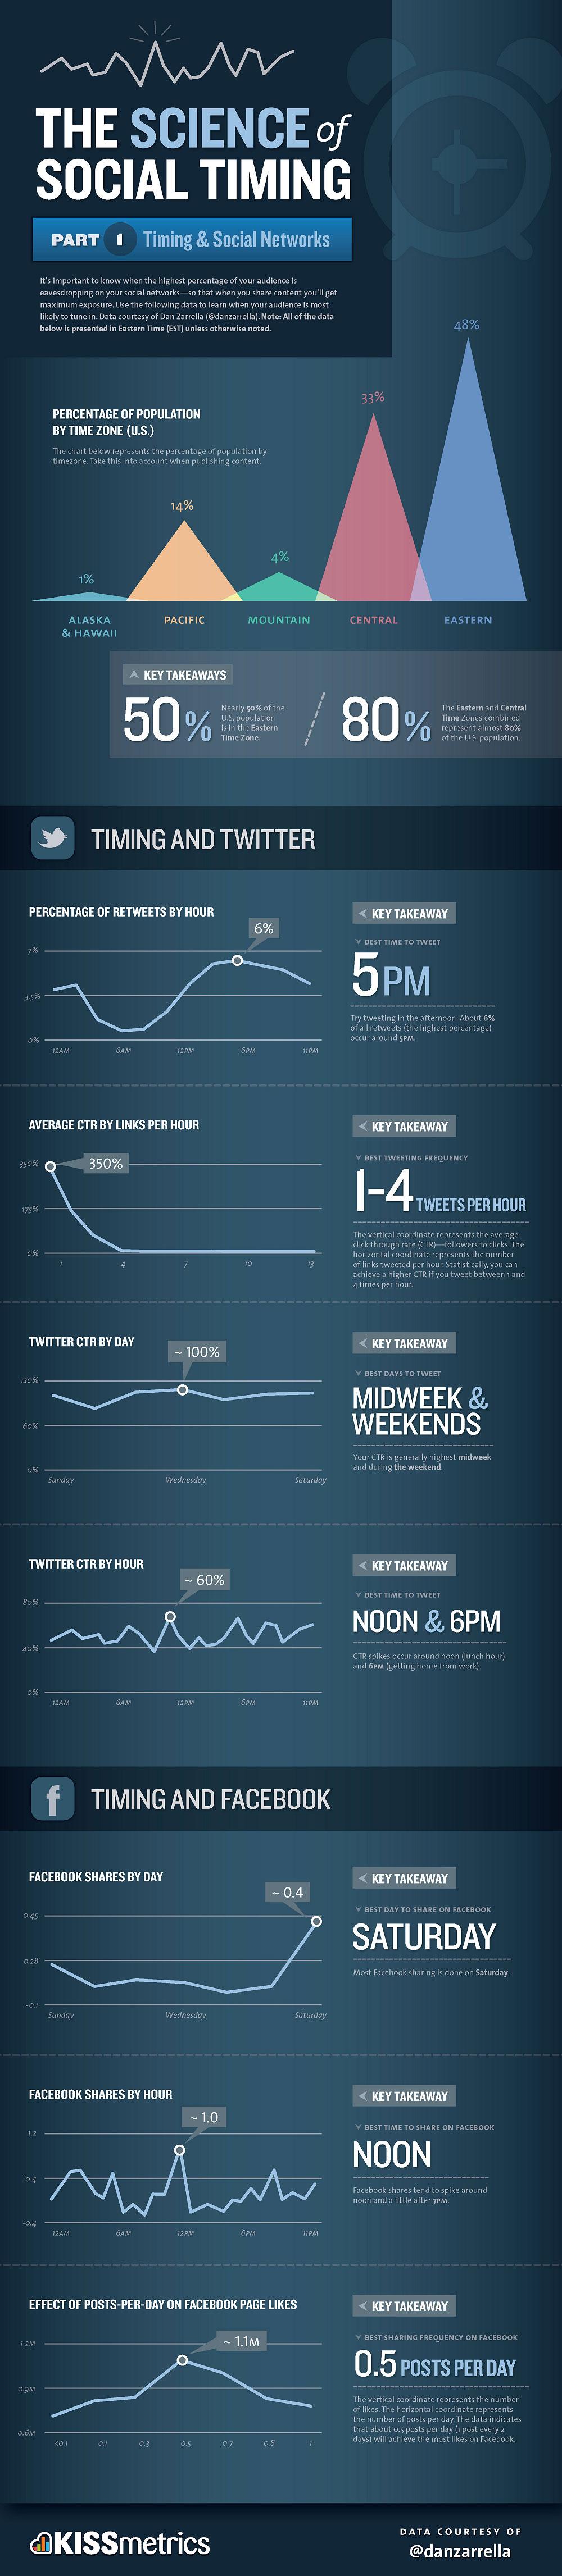 Social Timing als Durchschnitt (Quelle KISSmetrics.com)